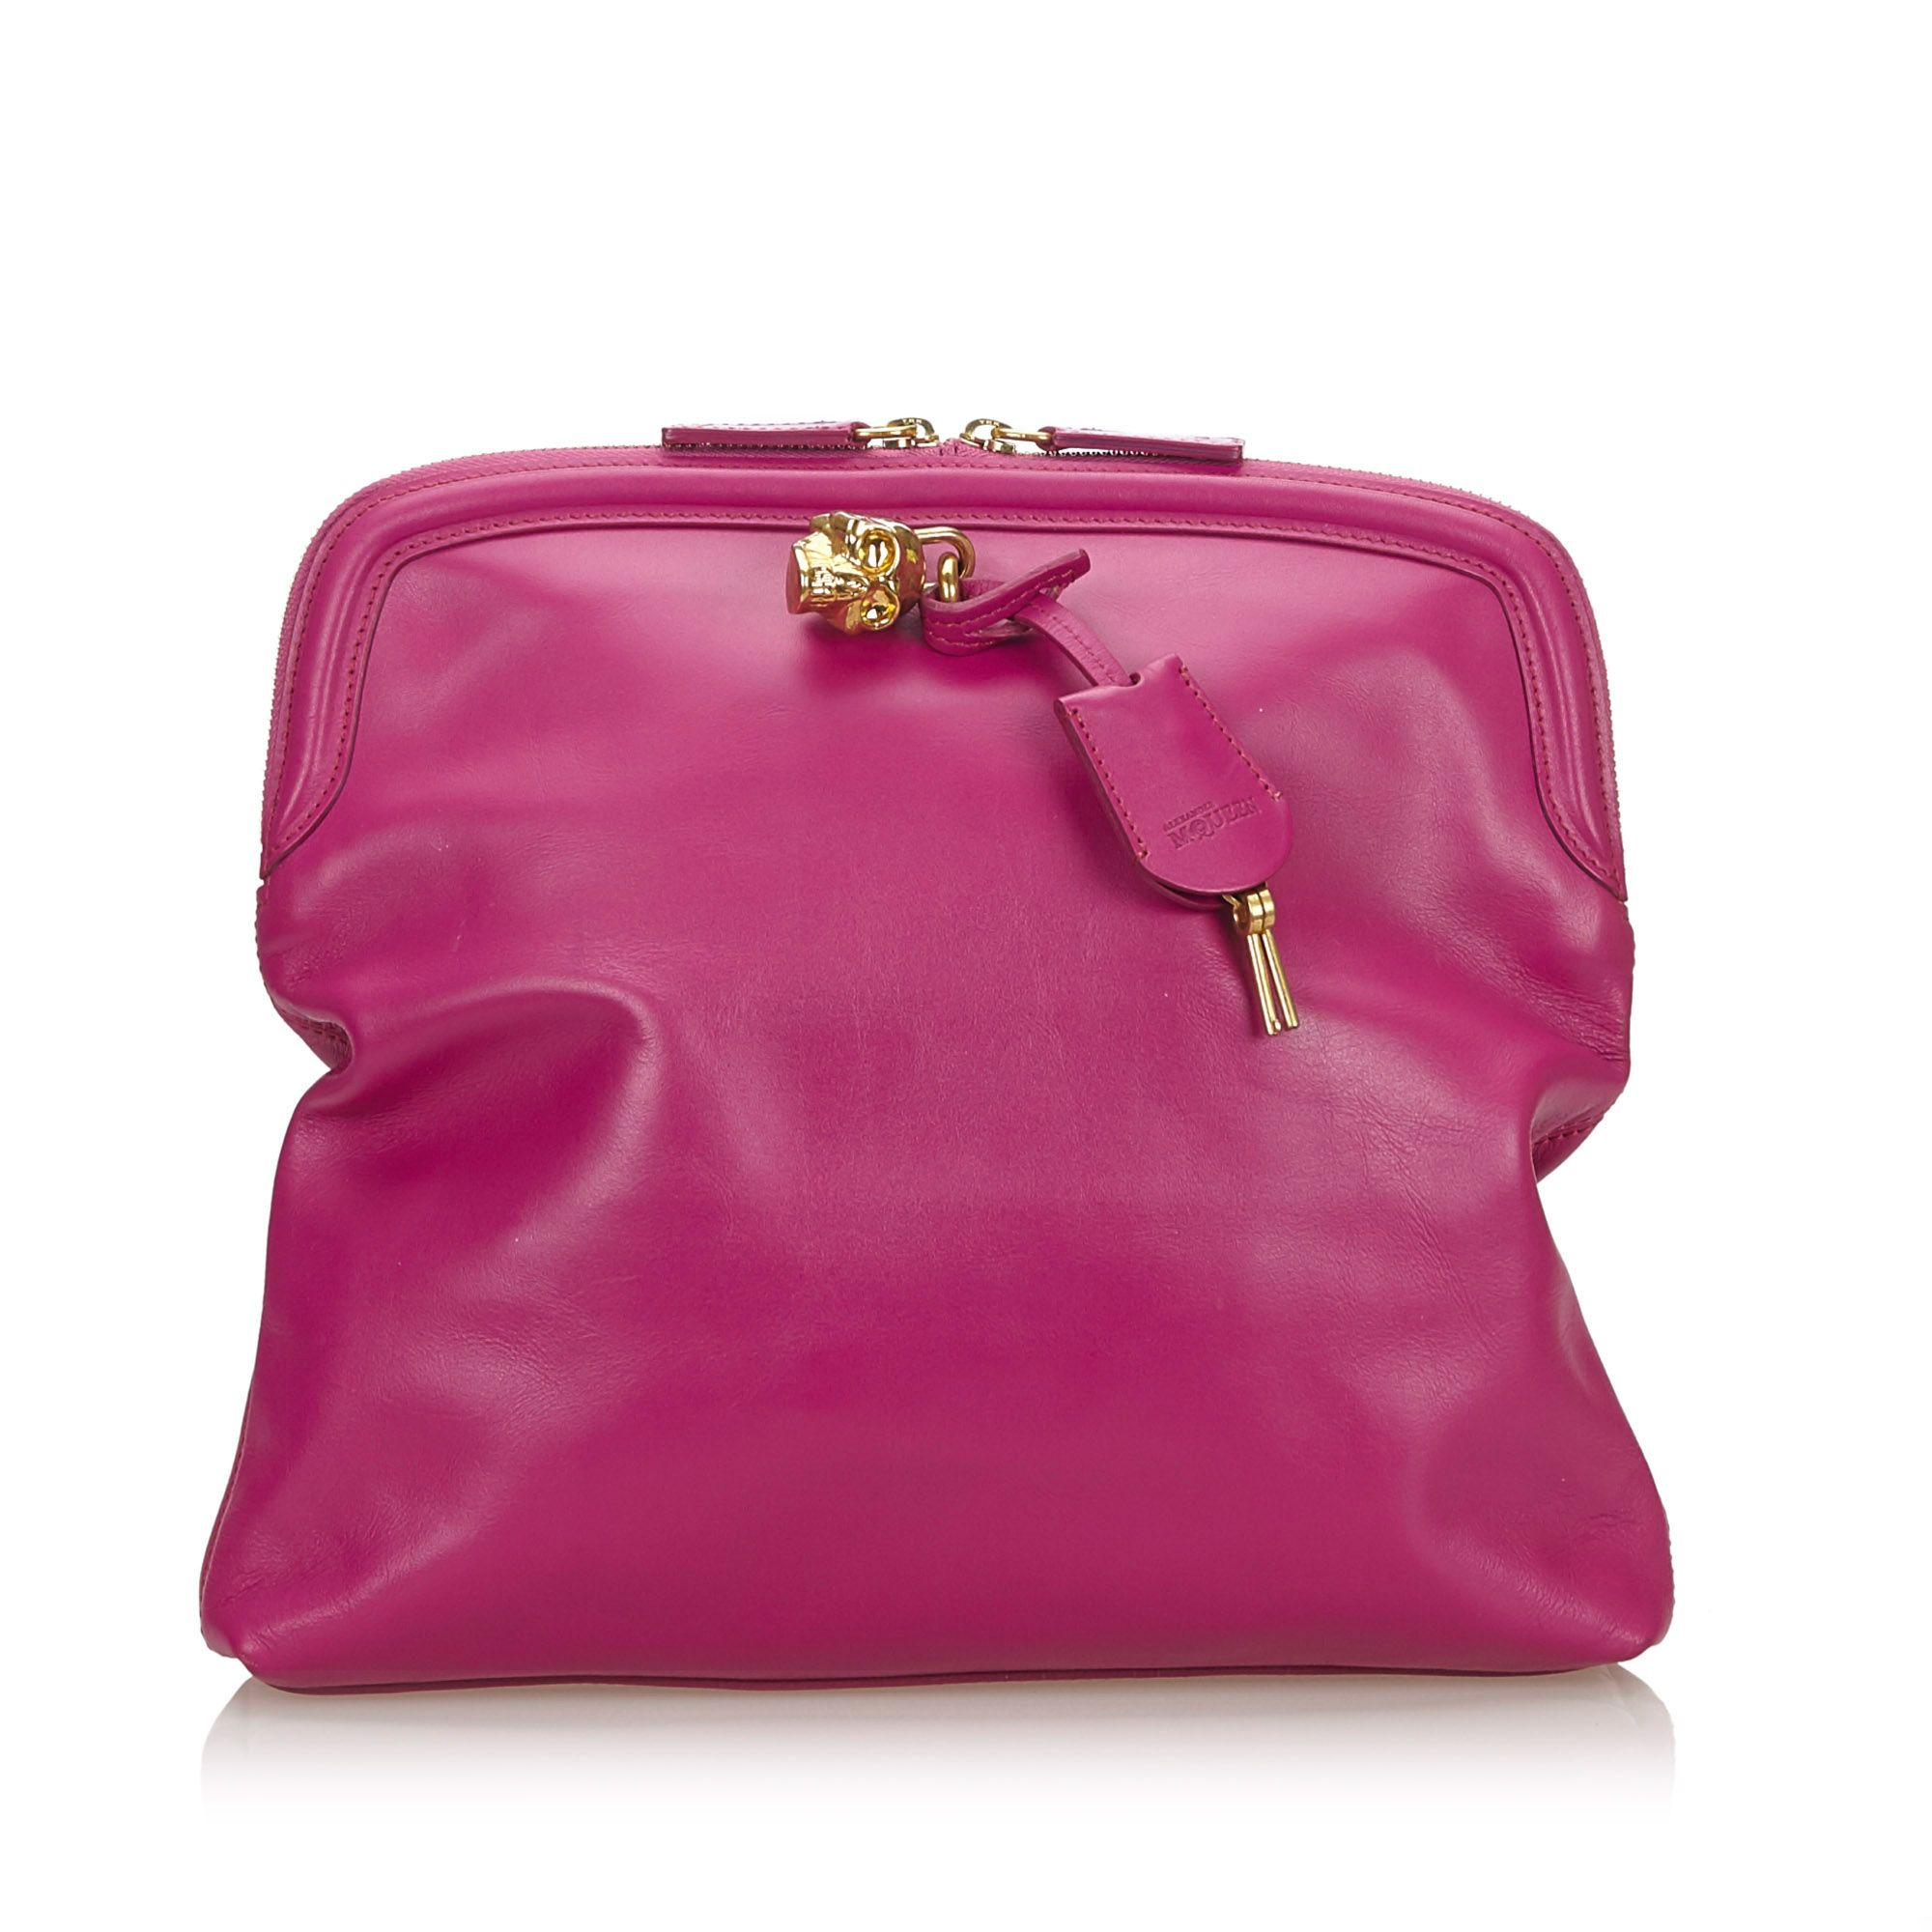 Vintage Alexander McQueen Skull Padlock Fold-over Clutch Bag Pink